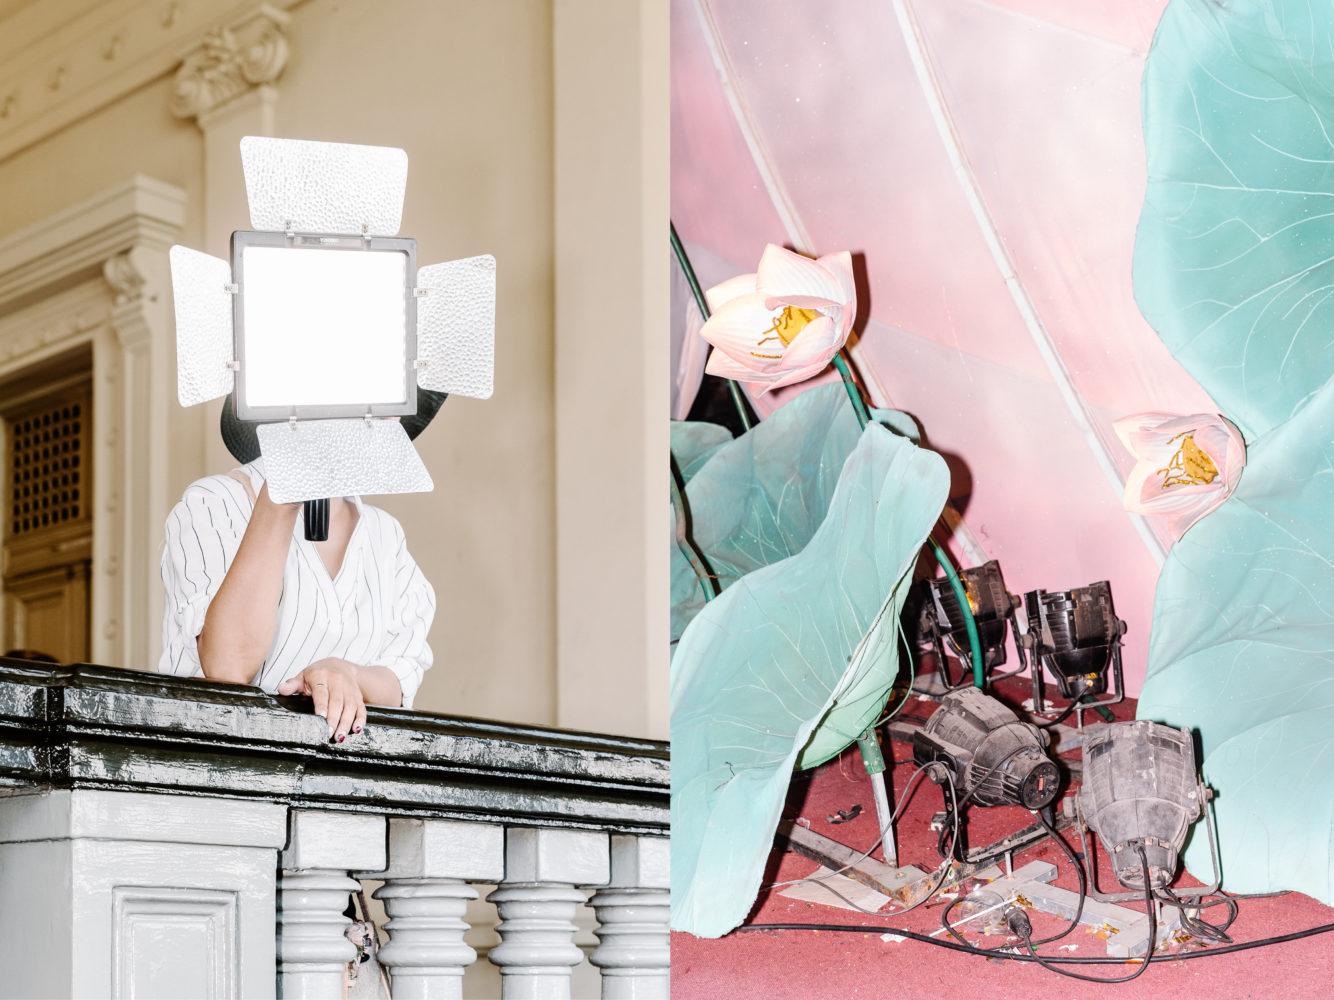 Simone Sapienza_Grand Prix Fotofestiwal 2019